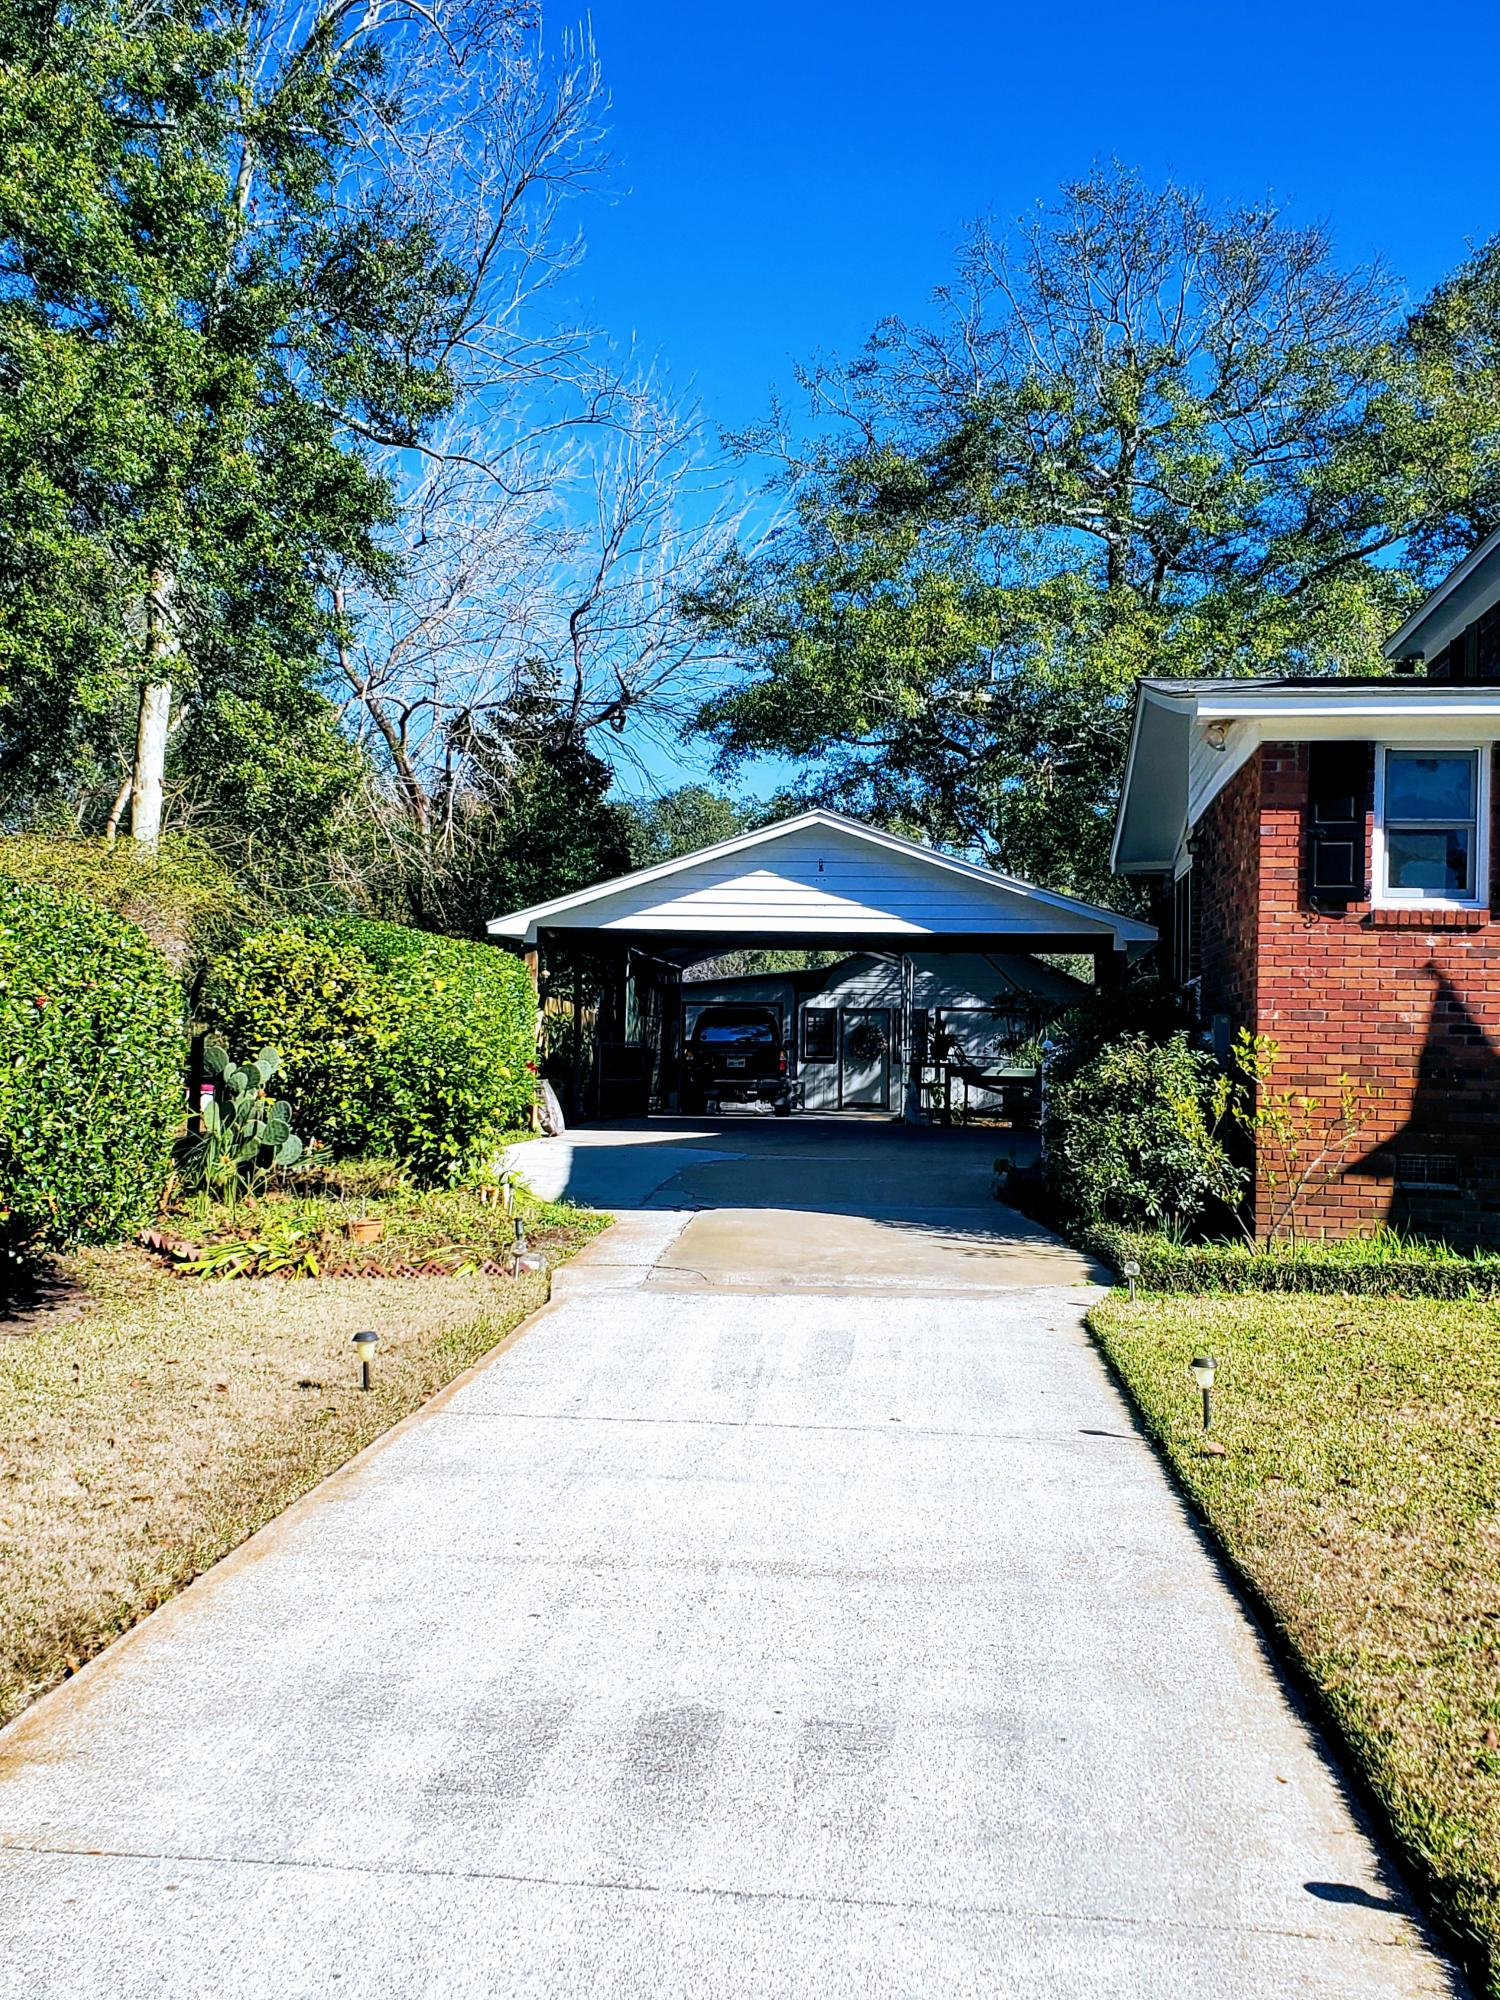 Bay View Acres Homes For Sale - 1127 Harborgate, Mount Pleasant, SC - 5